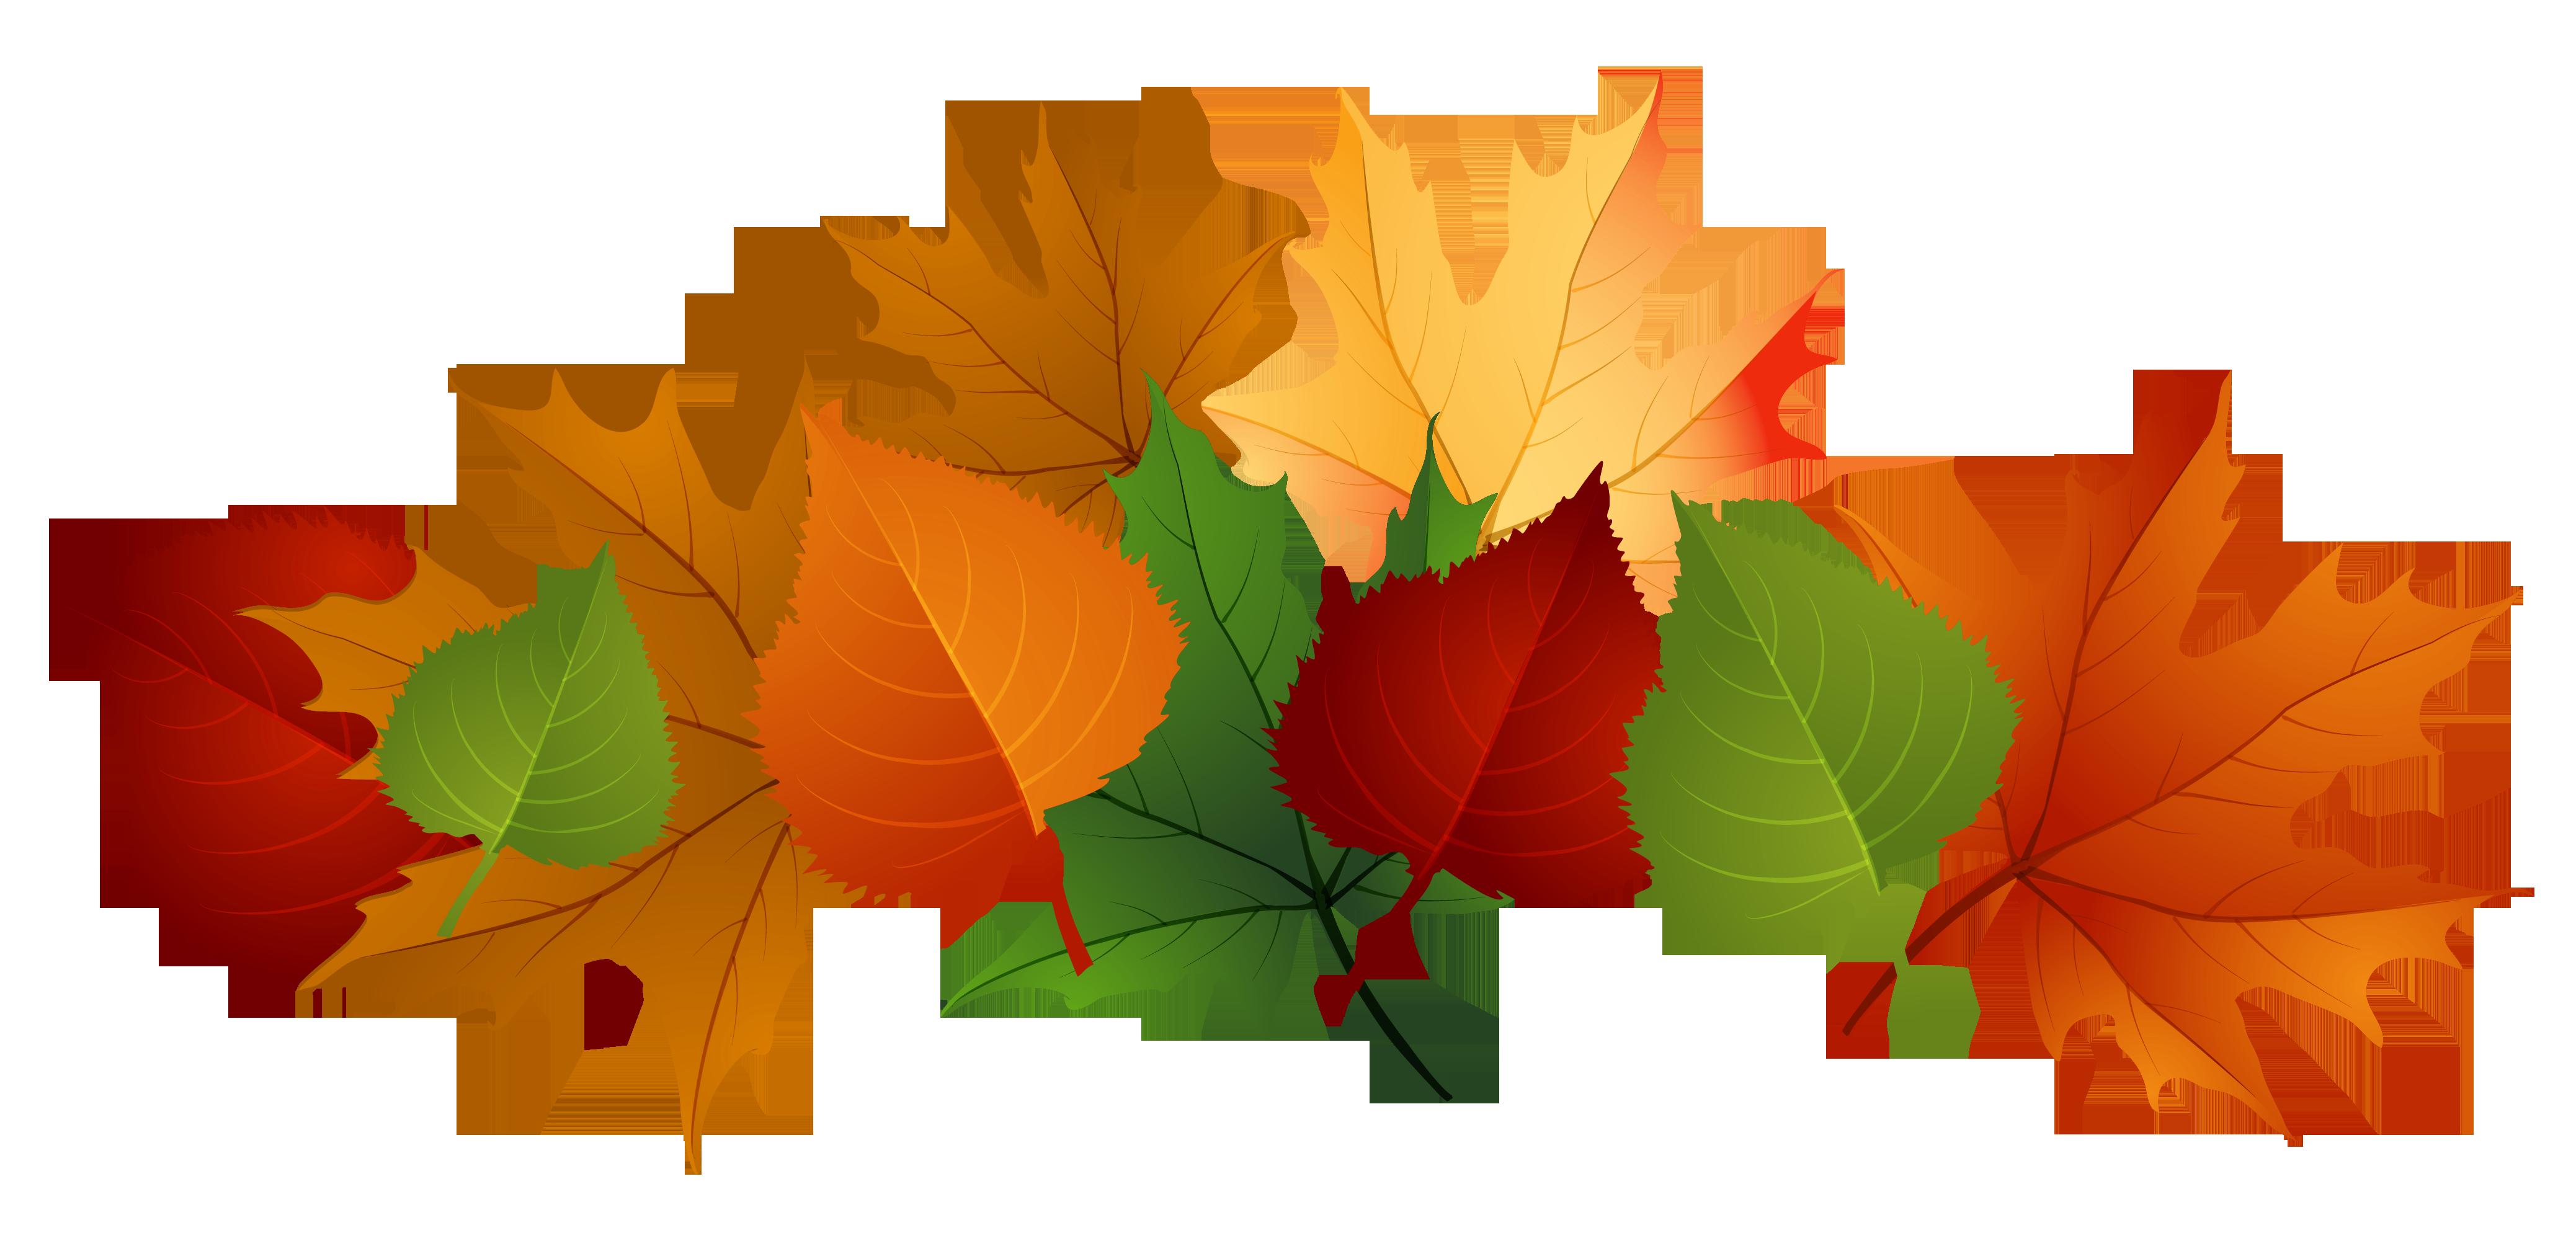 4153x1988 Falling Clipart Autumn Season